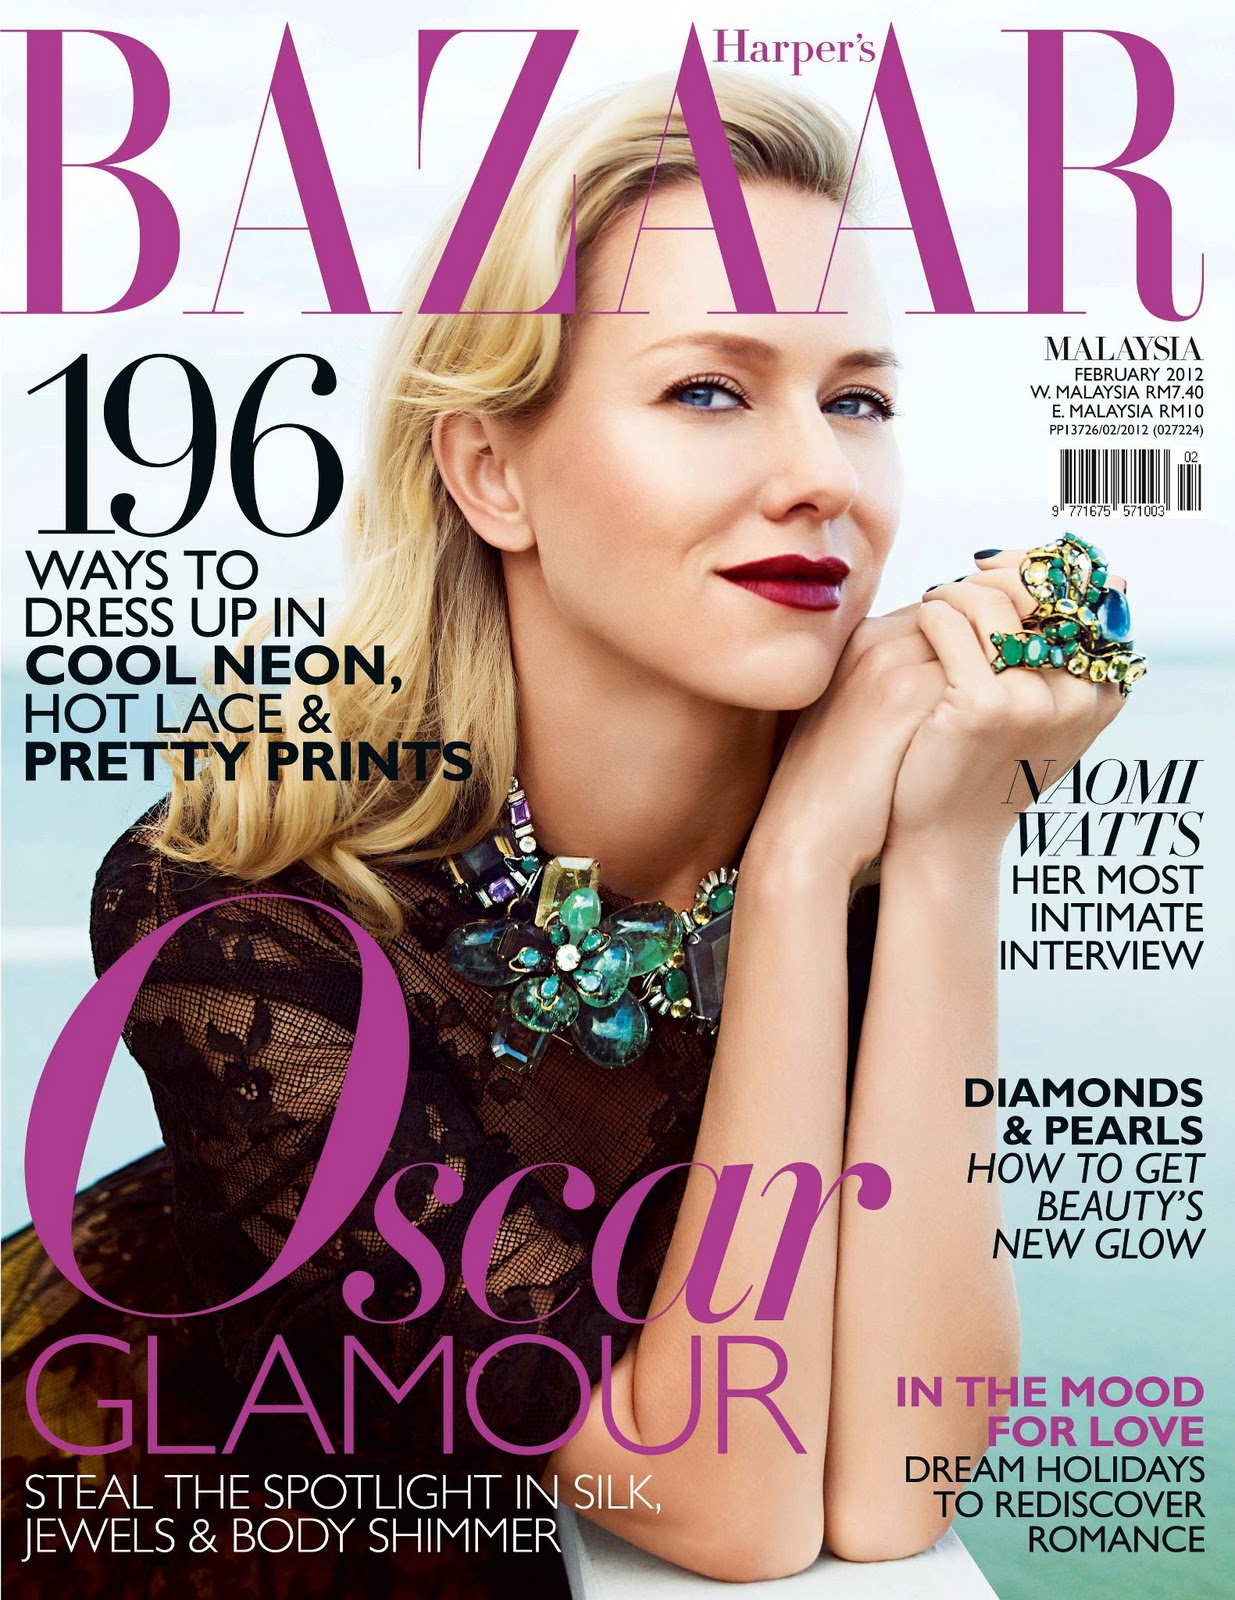 http://1.bp.blogspot.com/-dY09Gmi6Jnw/Tx6zcrgCcvI/AAAAAAAAVXM/UZiIjuuk9Cs/s1600/Harpers-Bazaar-Malaysia-February-2012-Naomi-Watts-Cover.jpg